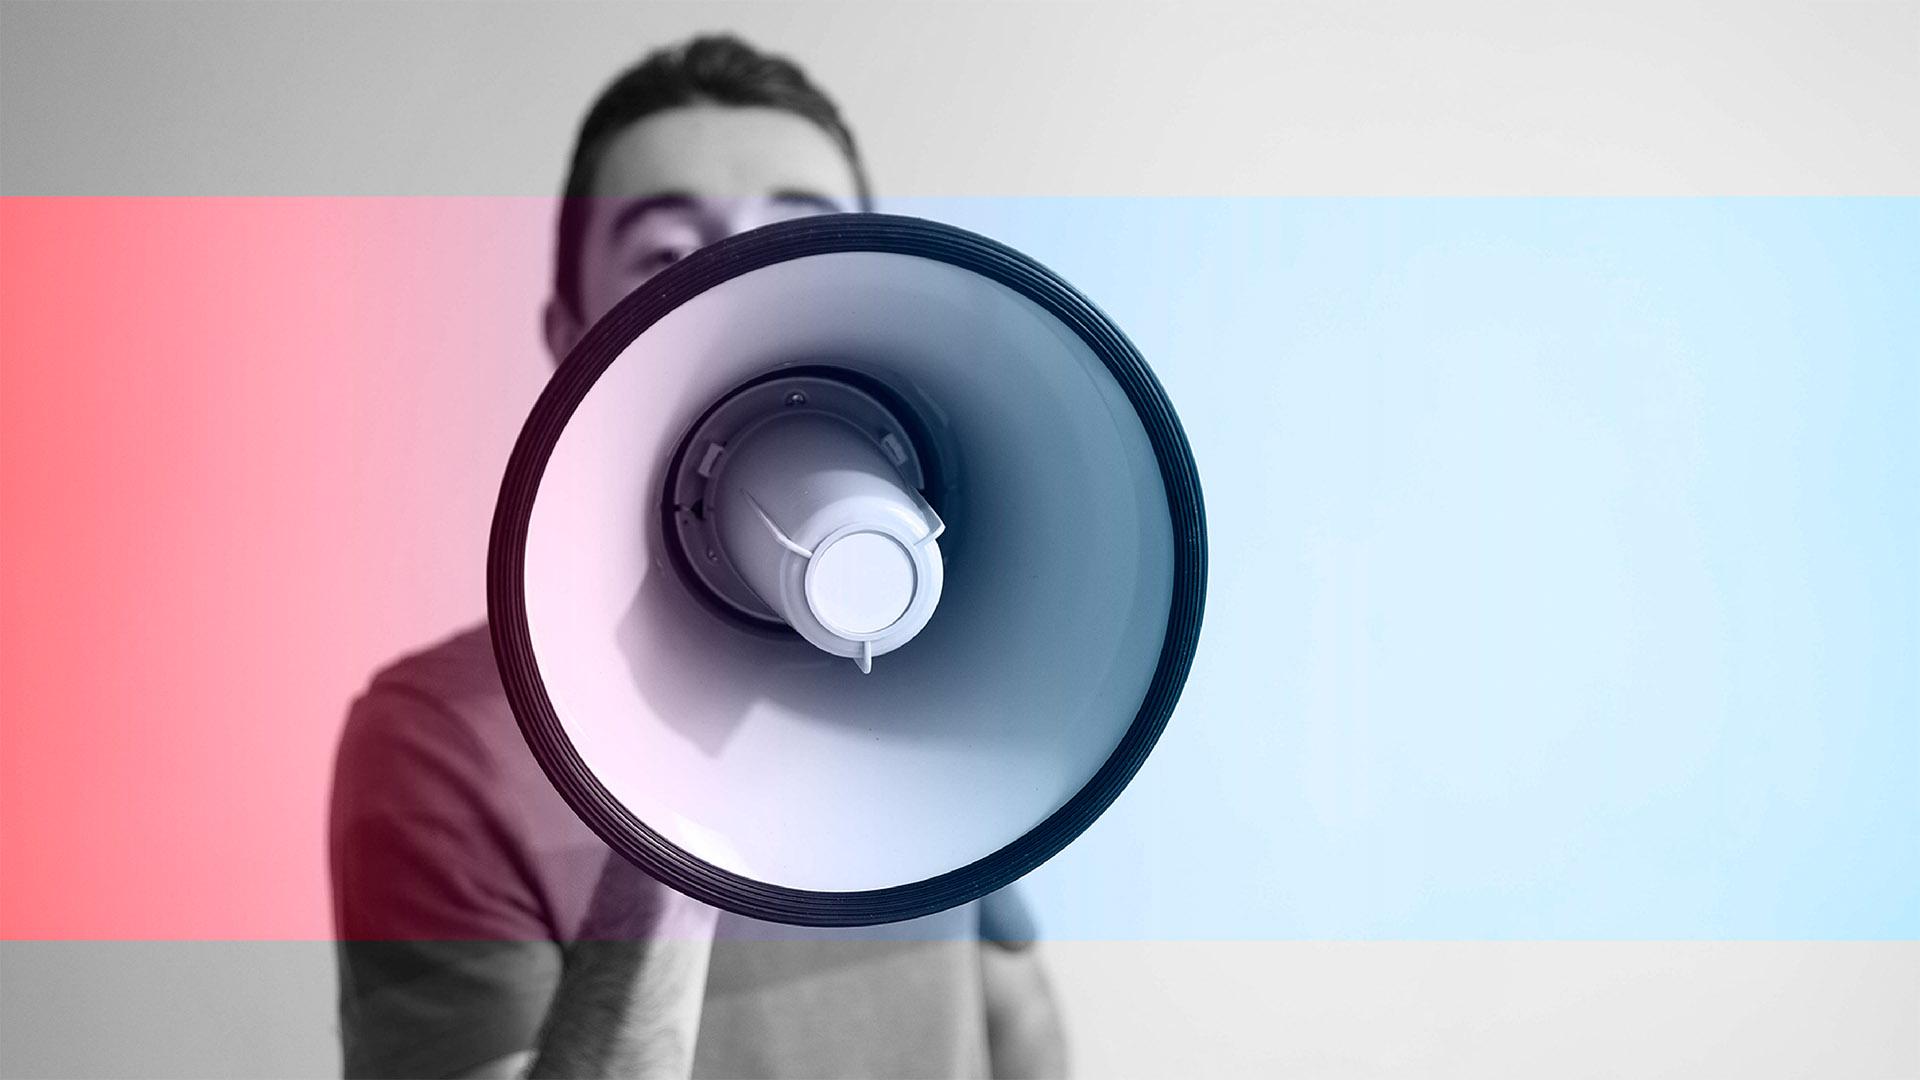 Redes comunitarias frente a la censura oficial, por Roberto Patiño